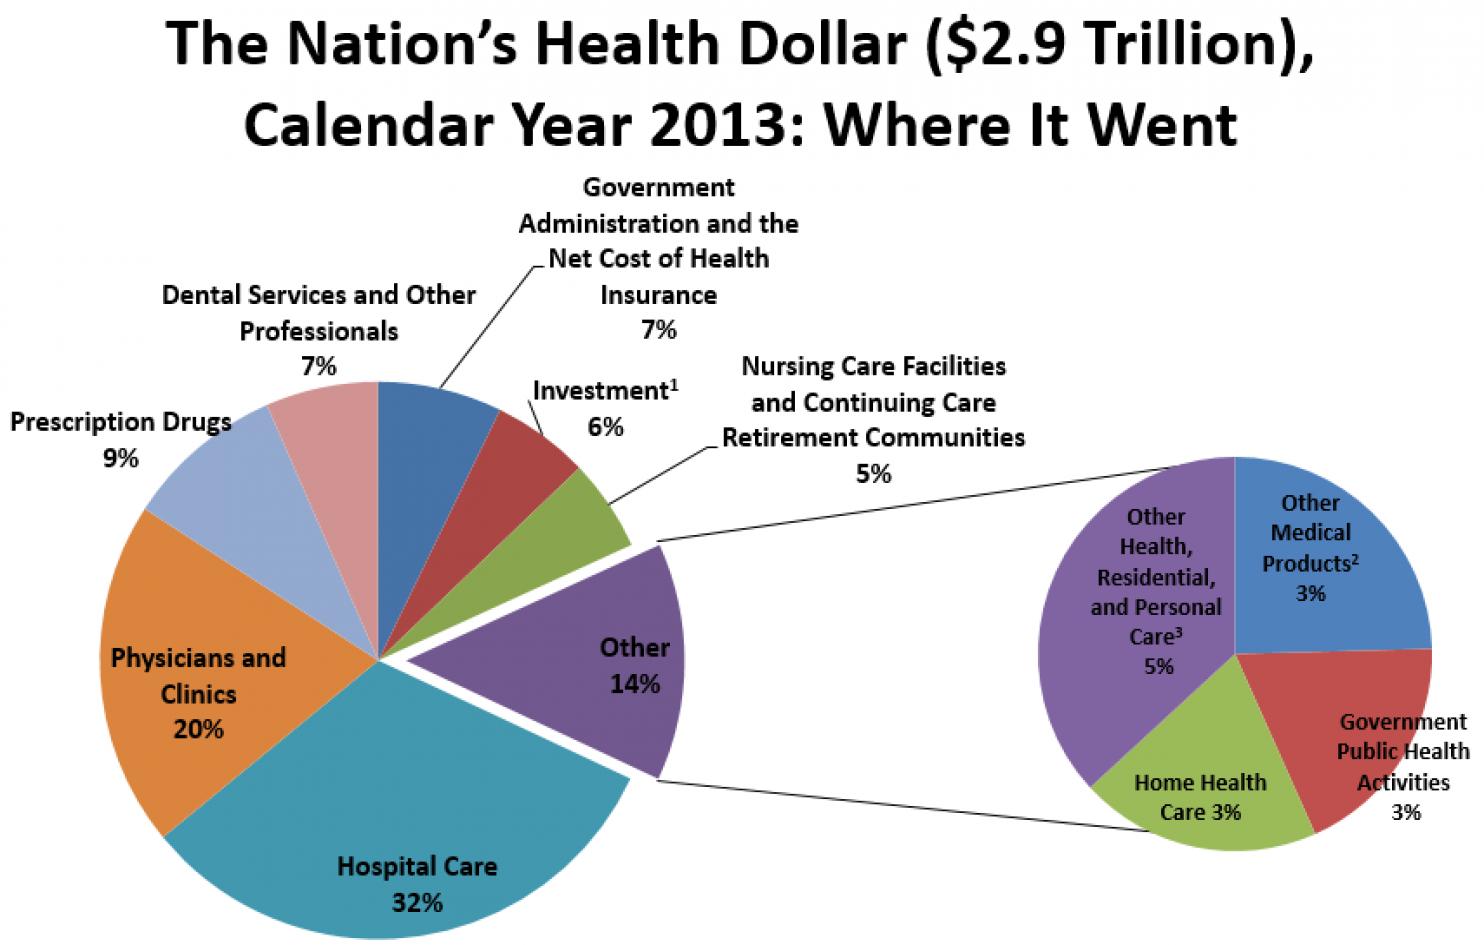 US Health Care Spending in 2013 - Healthcare Economist